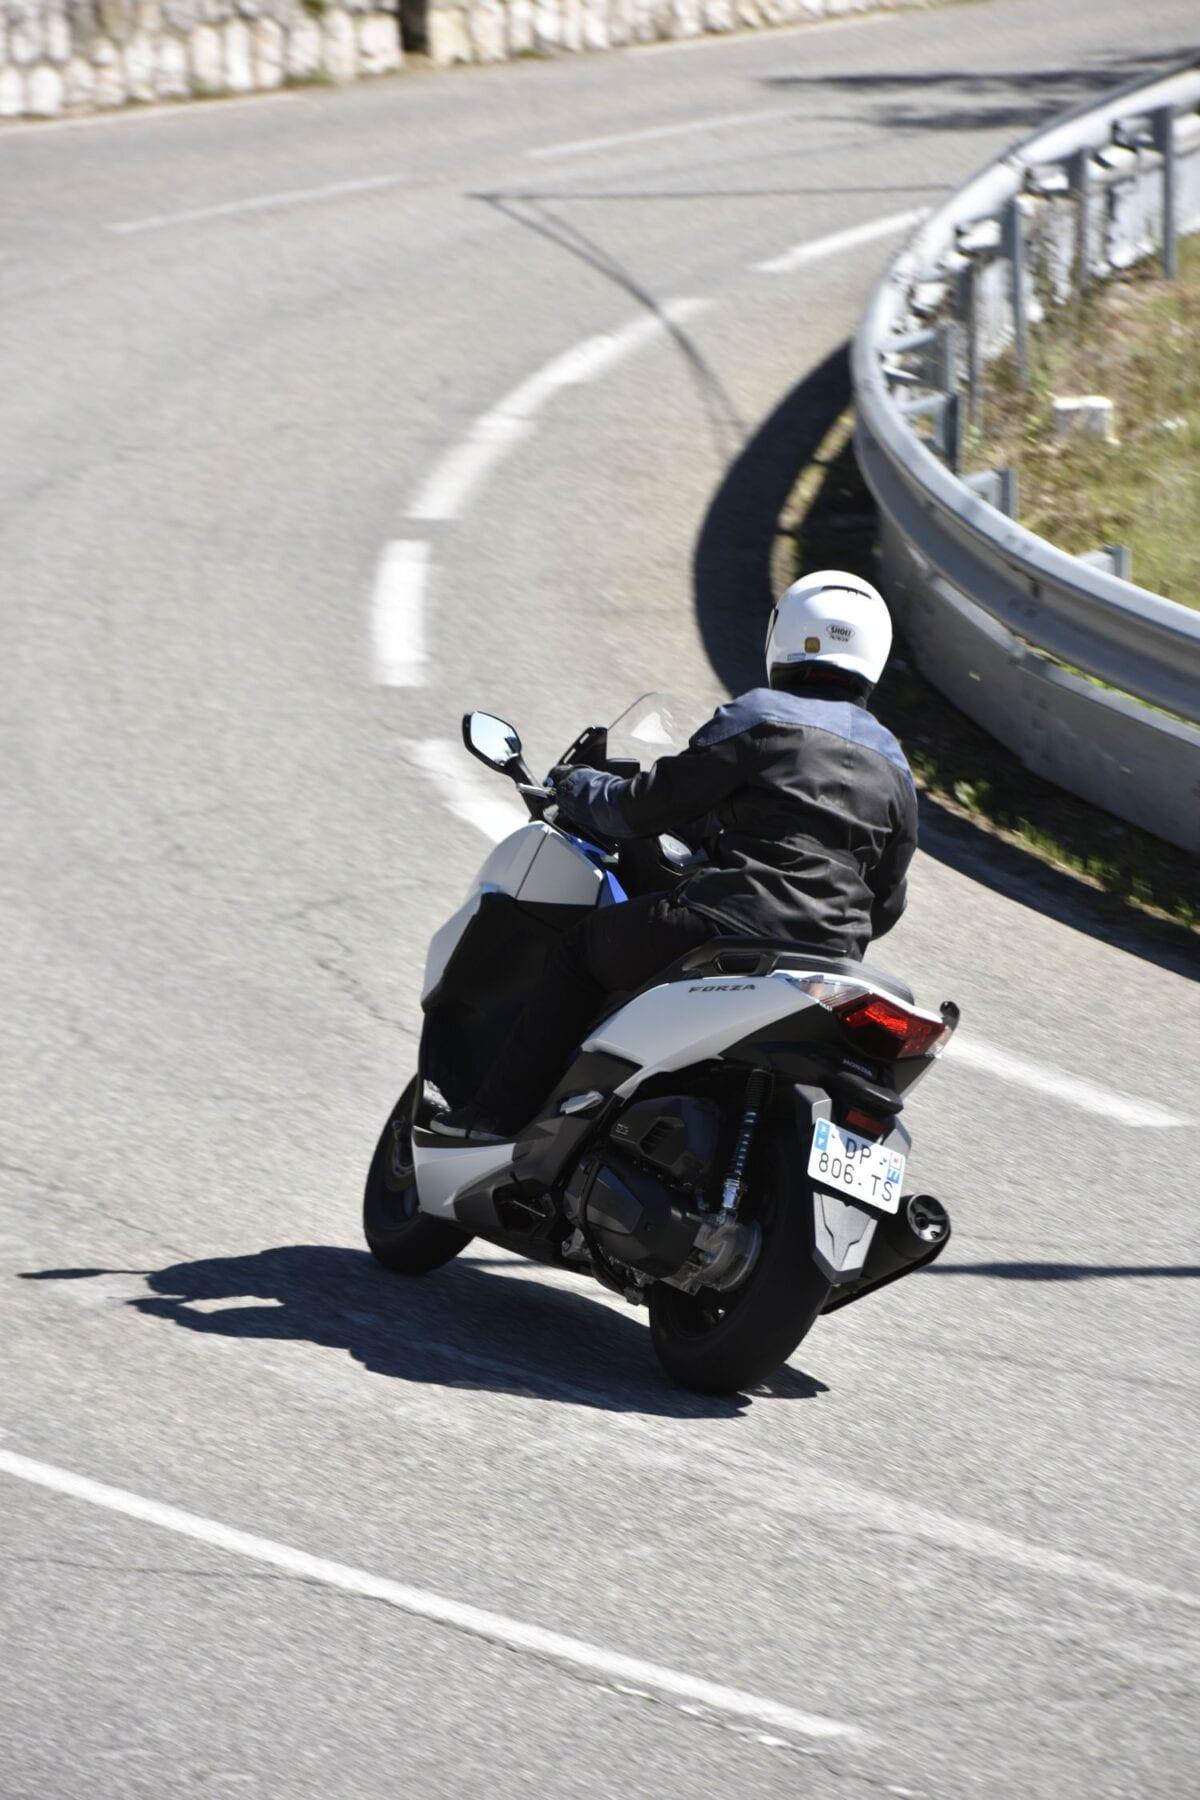 026 Honda-Forza125-YM15-1836lores